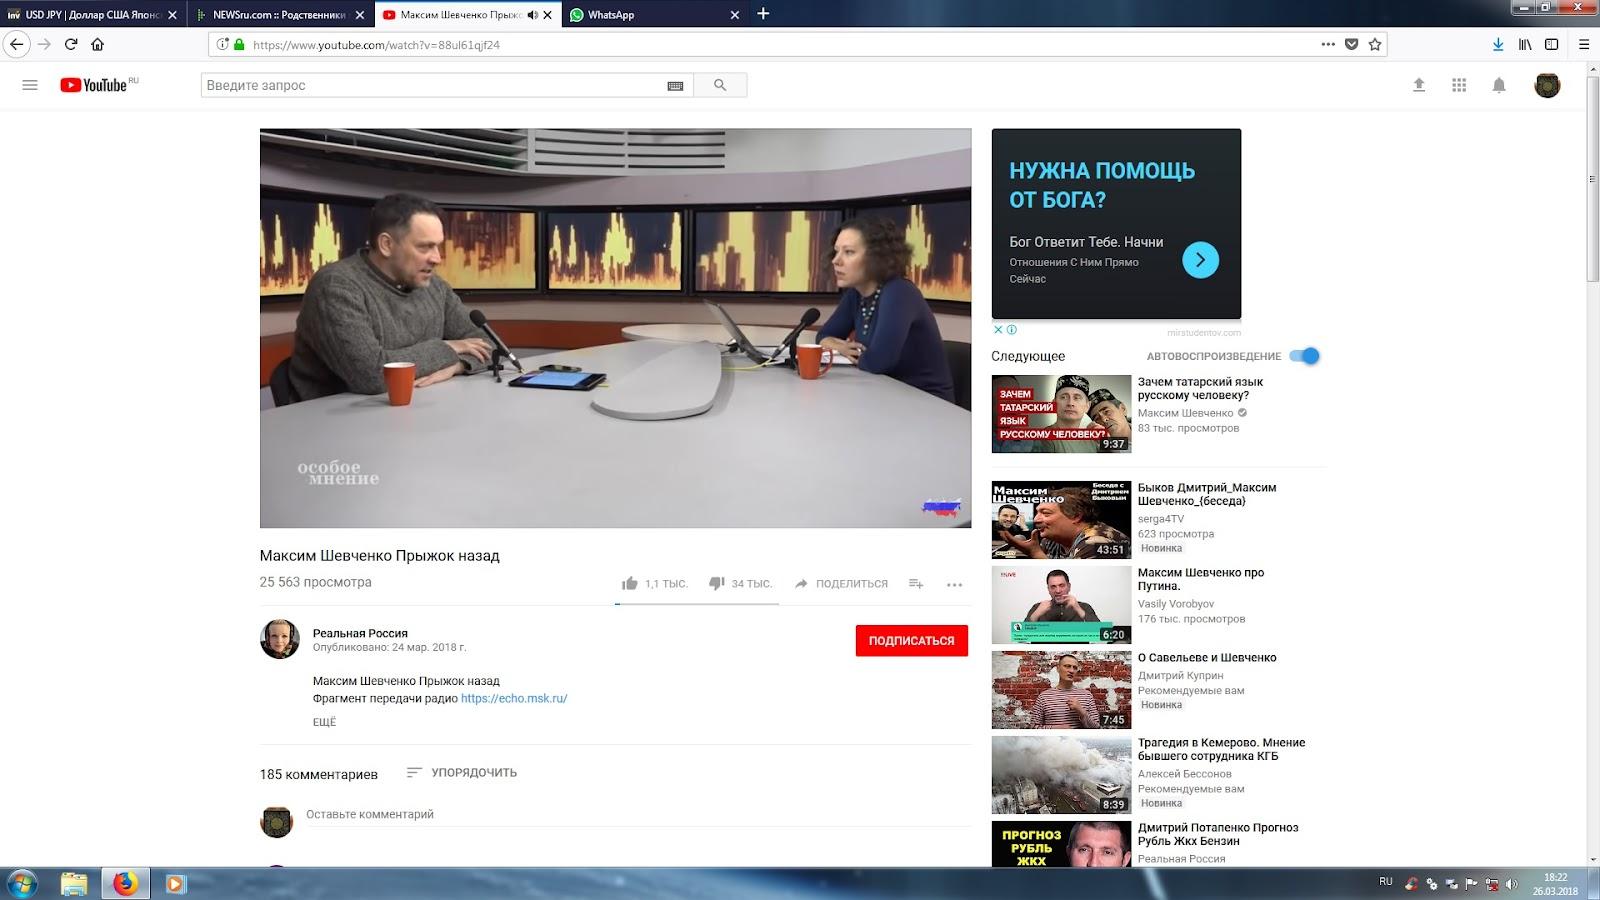 Youtube in Russia - Bantuan YouTube